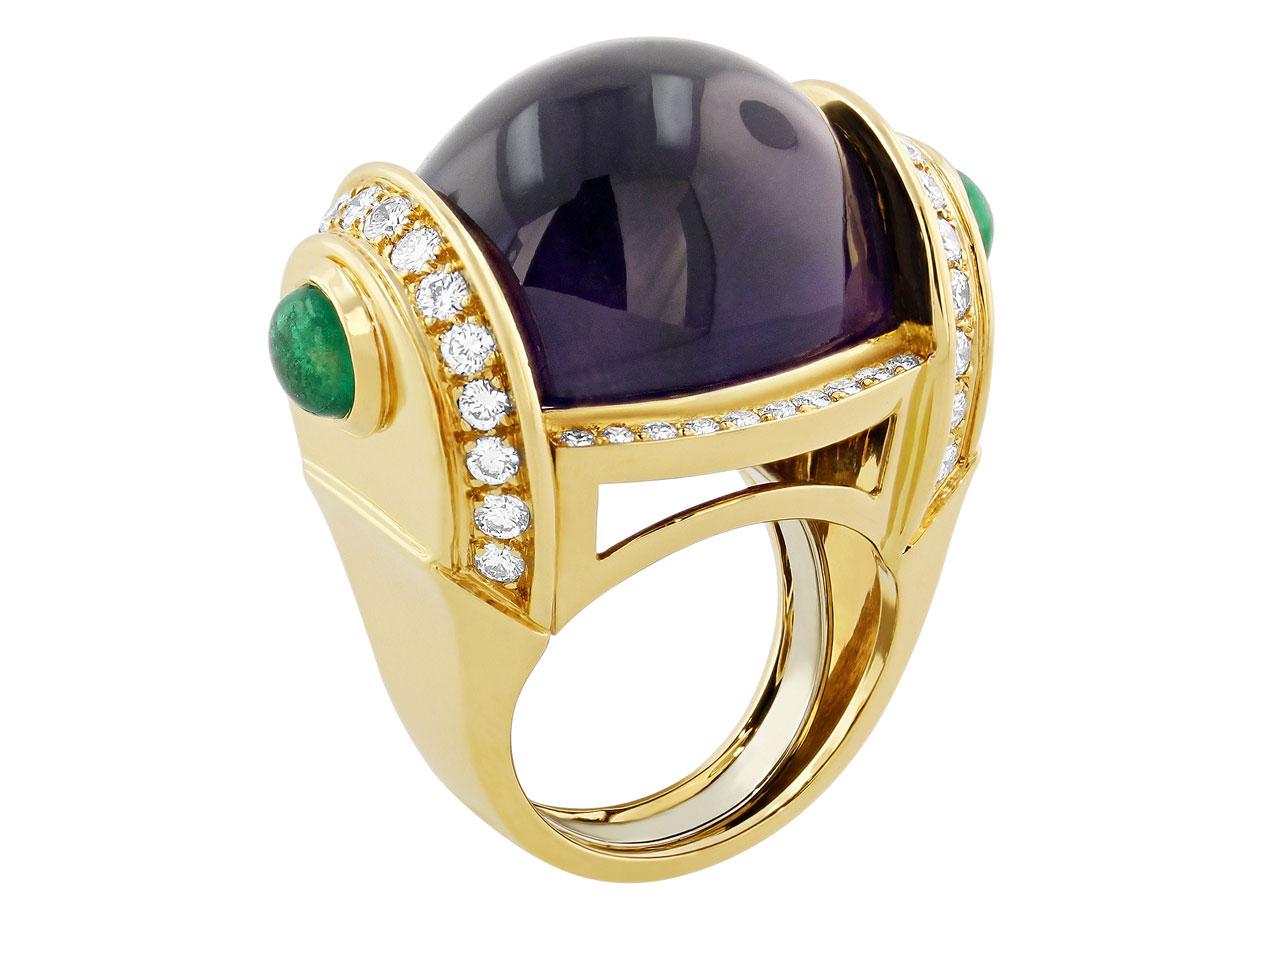 David_Webb_Amethyst_Diamond_and_Emerald_ring_in_18K